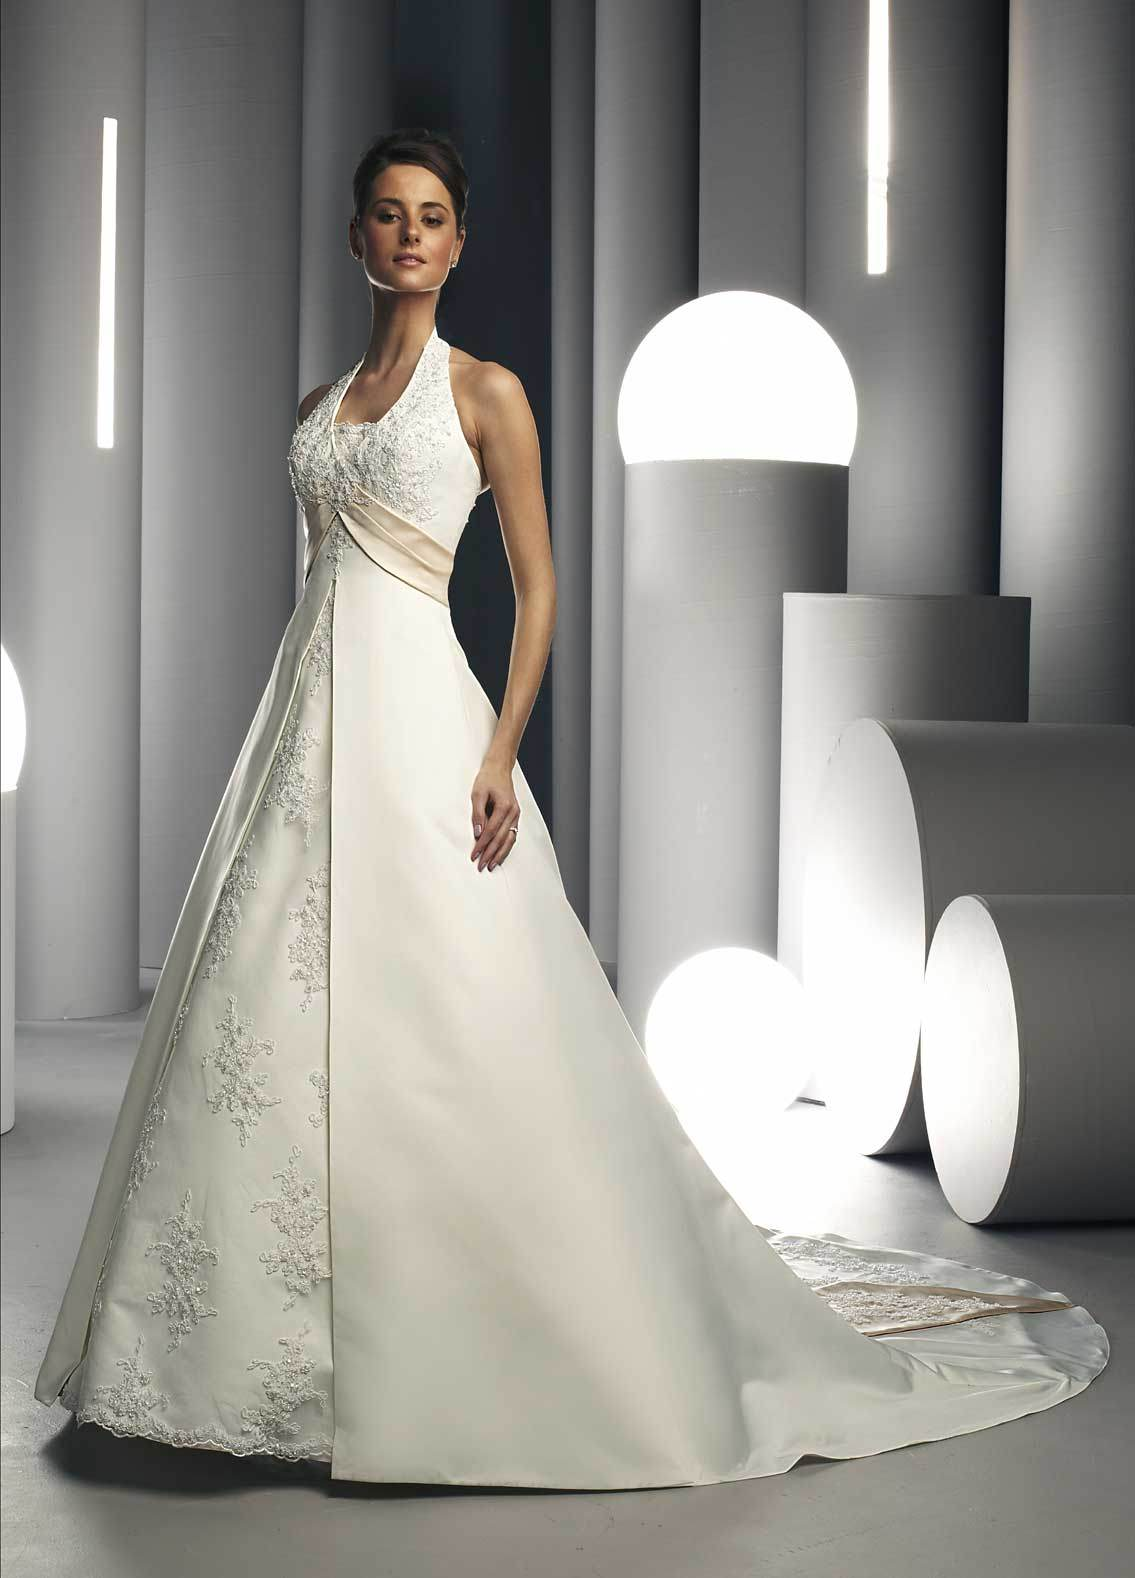 halter top a line wedding dresses halter top wedding dresses Halter Top A Line Wedding Dresses 28